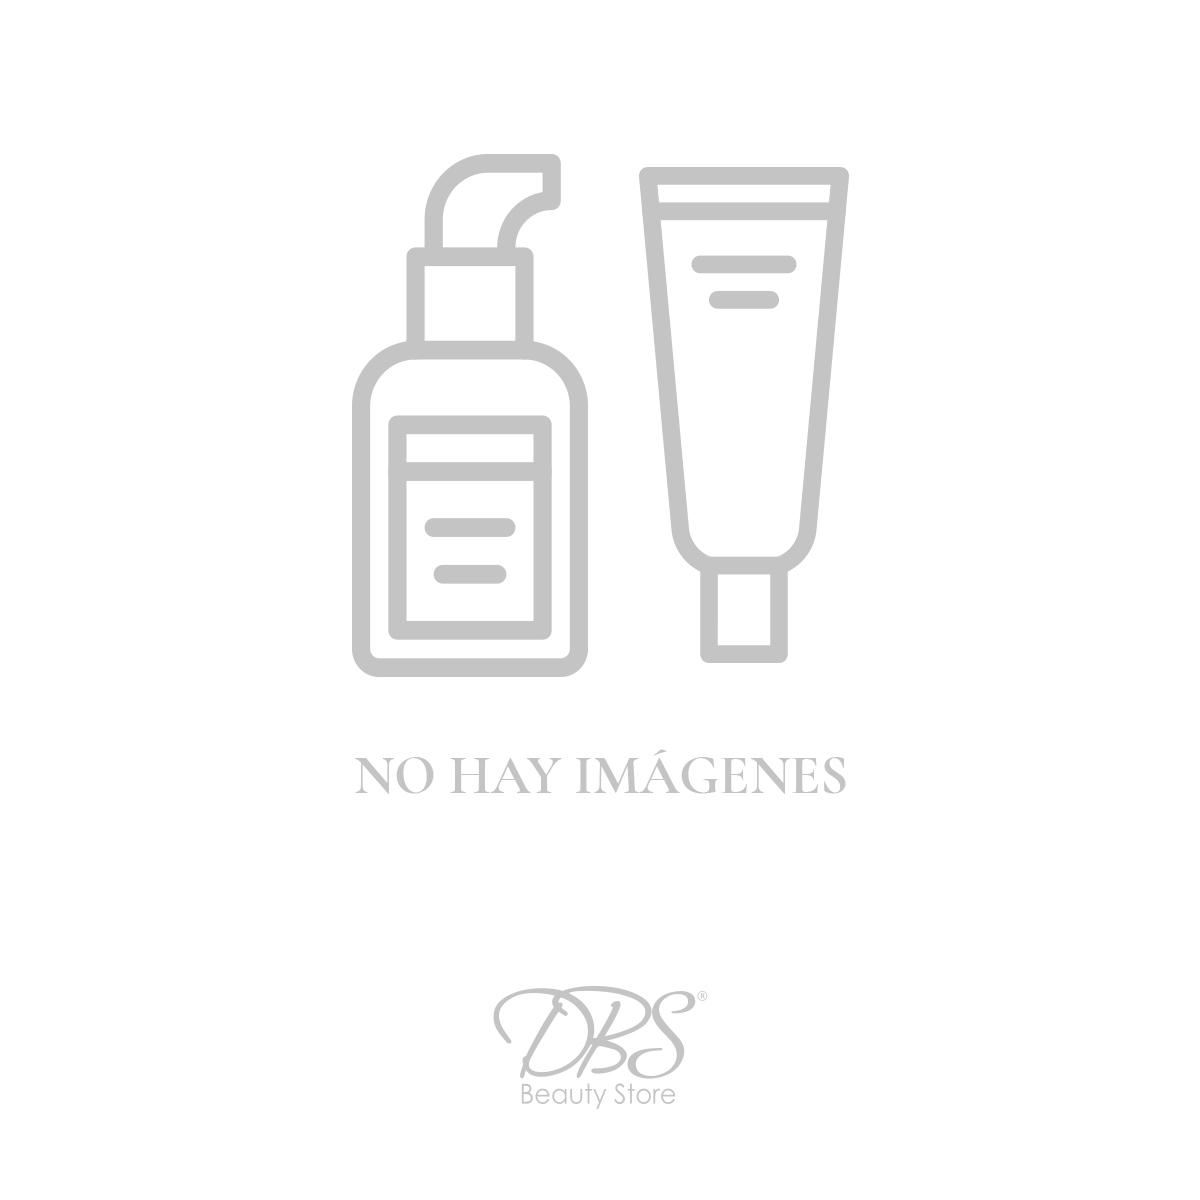 body-luxuries-BL-001-MP.jpg